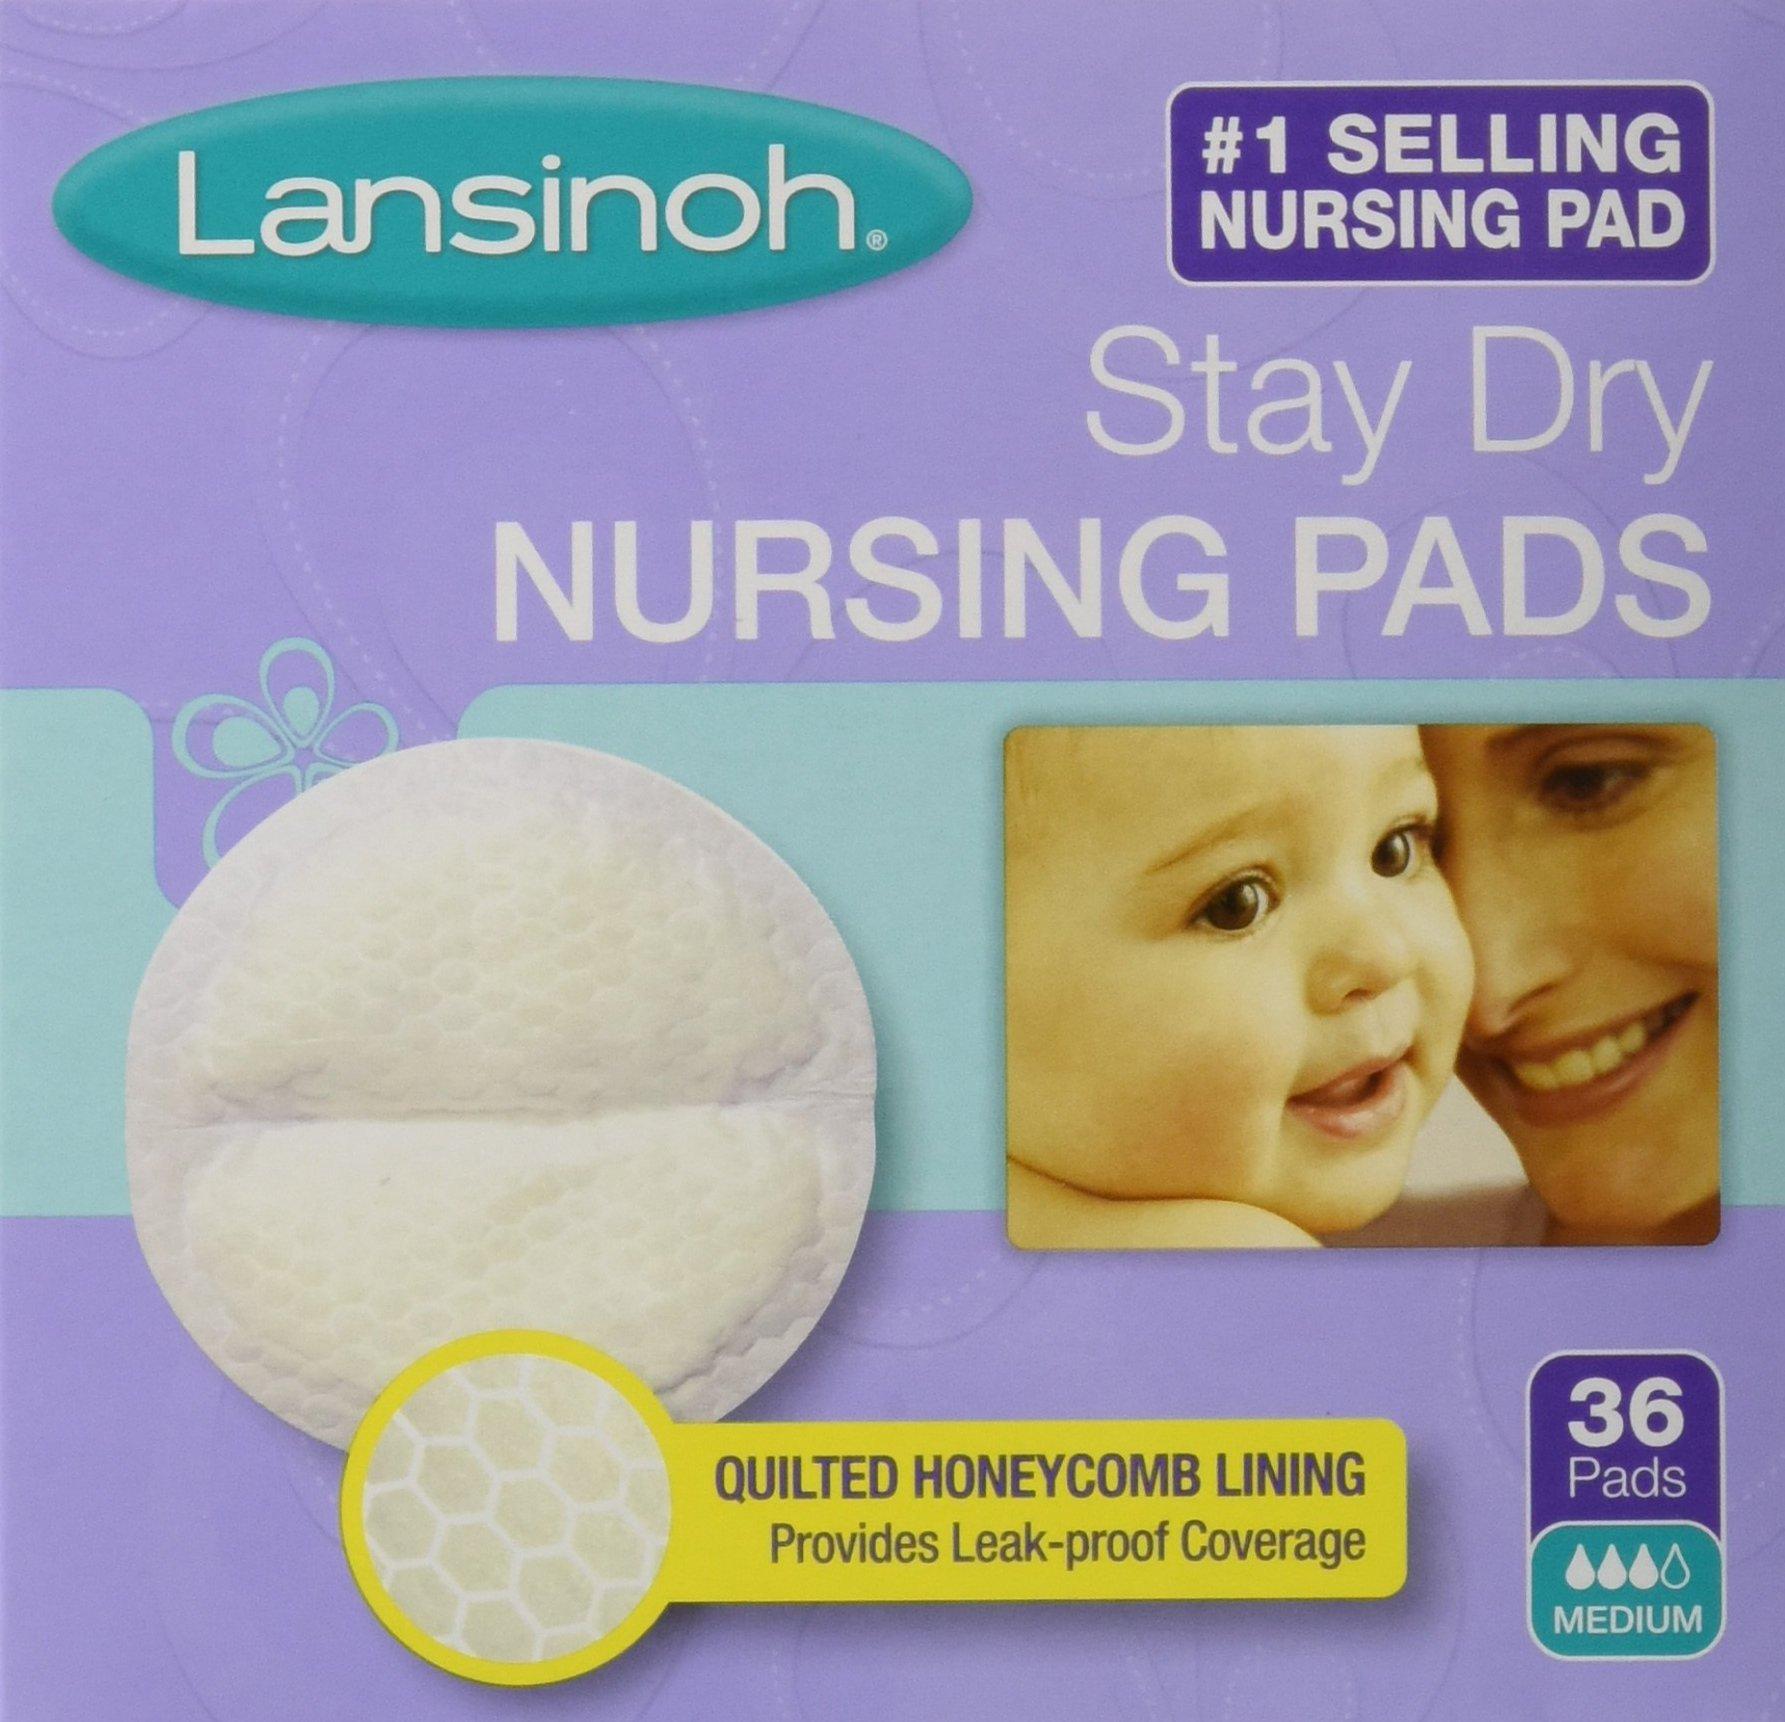 Lansinoh Stay Dry Nursing Pads Medium 36 Each (Pack of 2) by Lansinoh